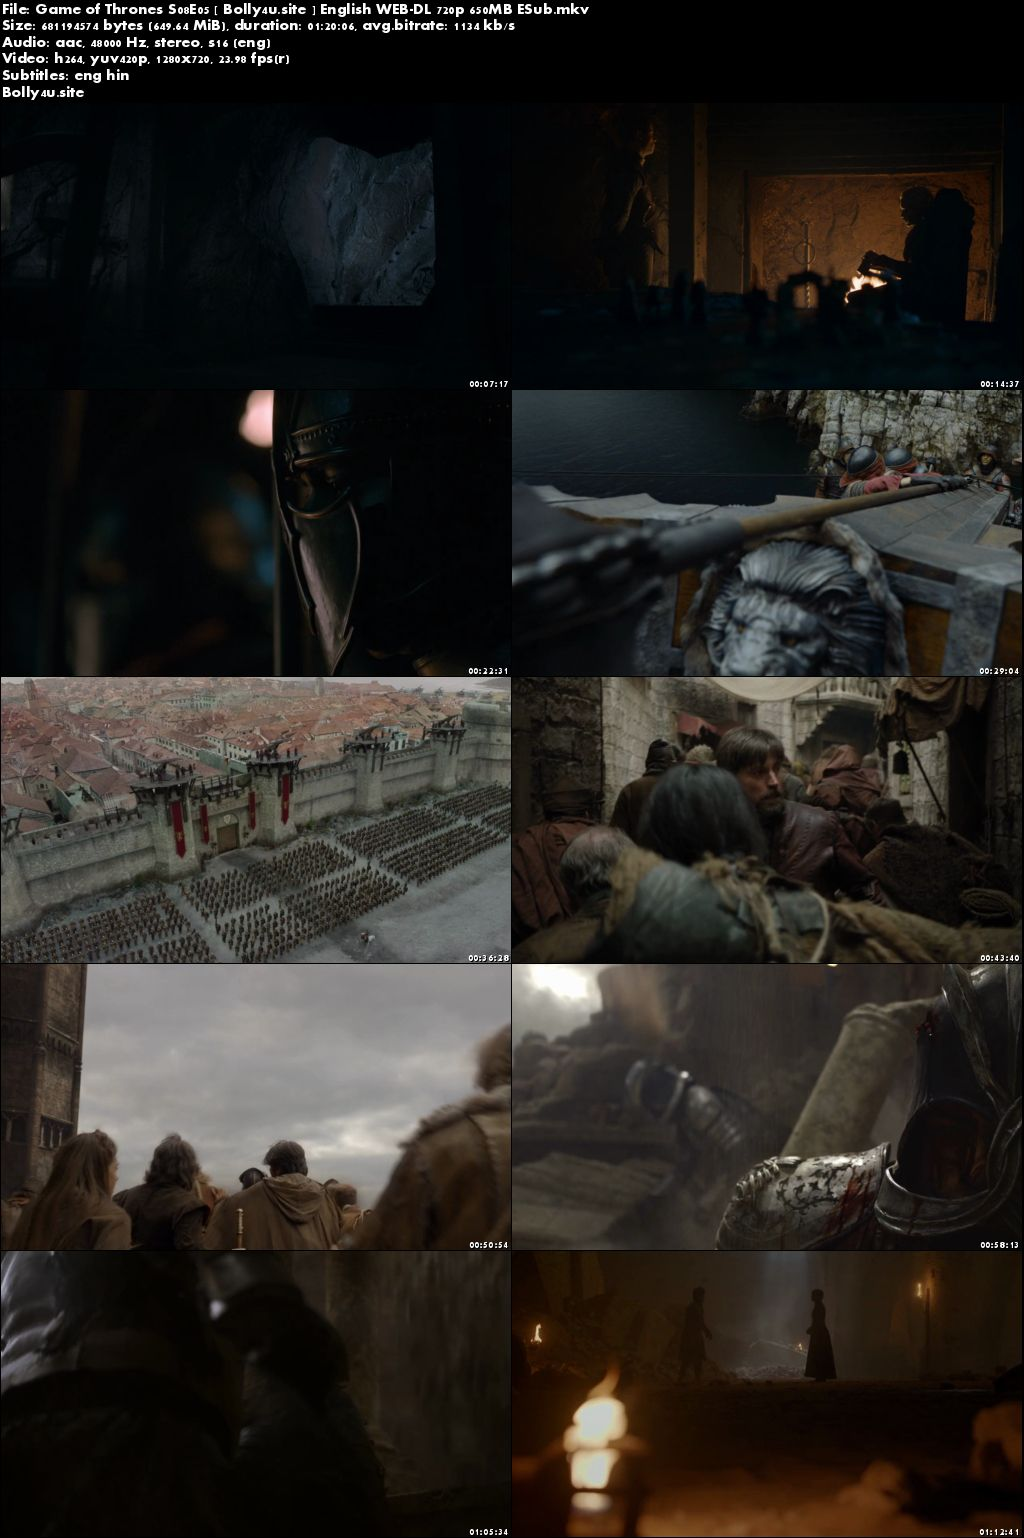 Game of Thrones S08E05 WEB-DL 650MB English 720p Hindi ESub Download